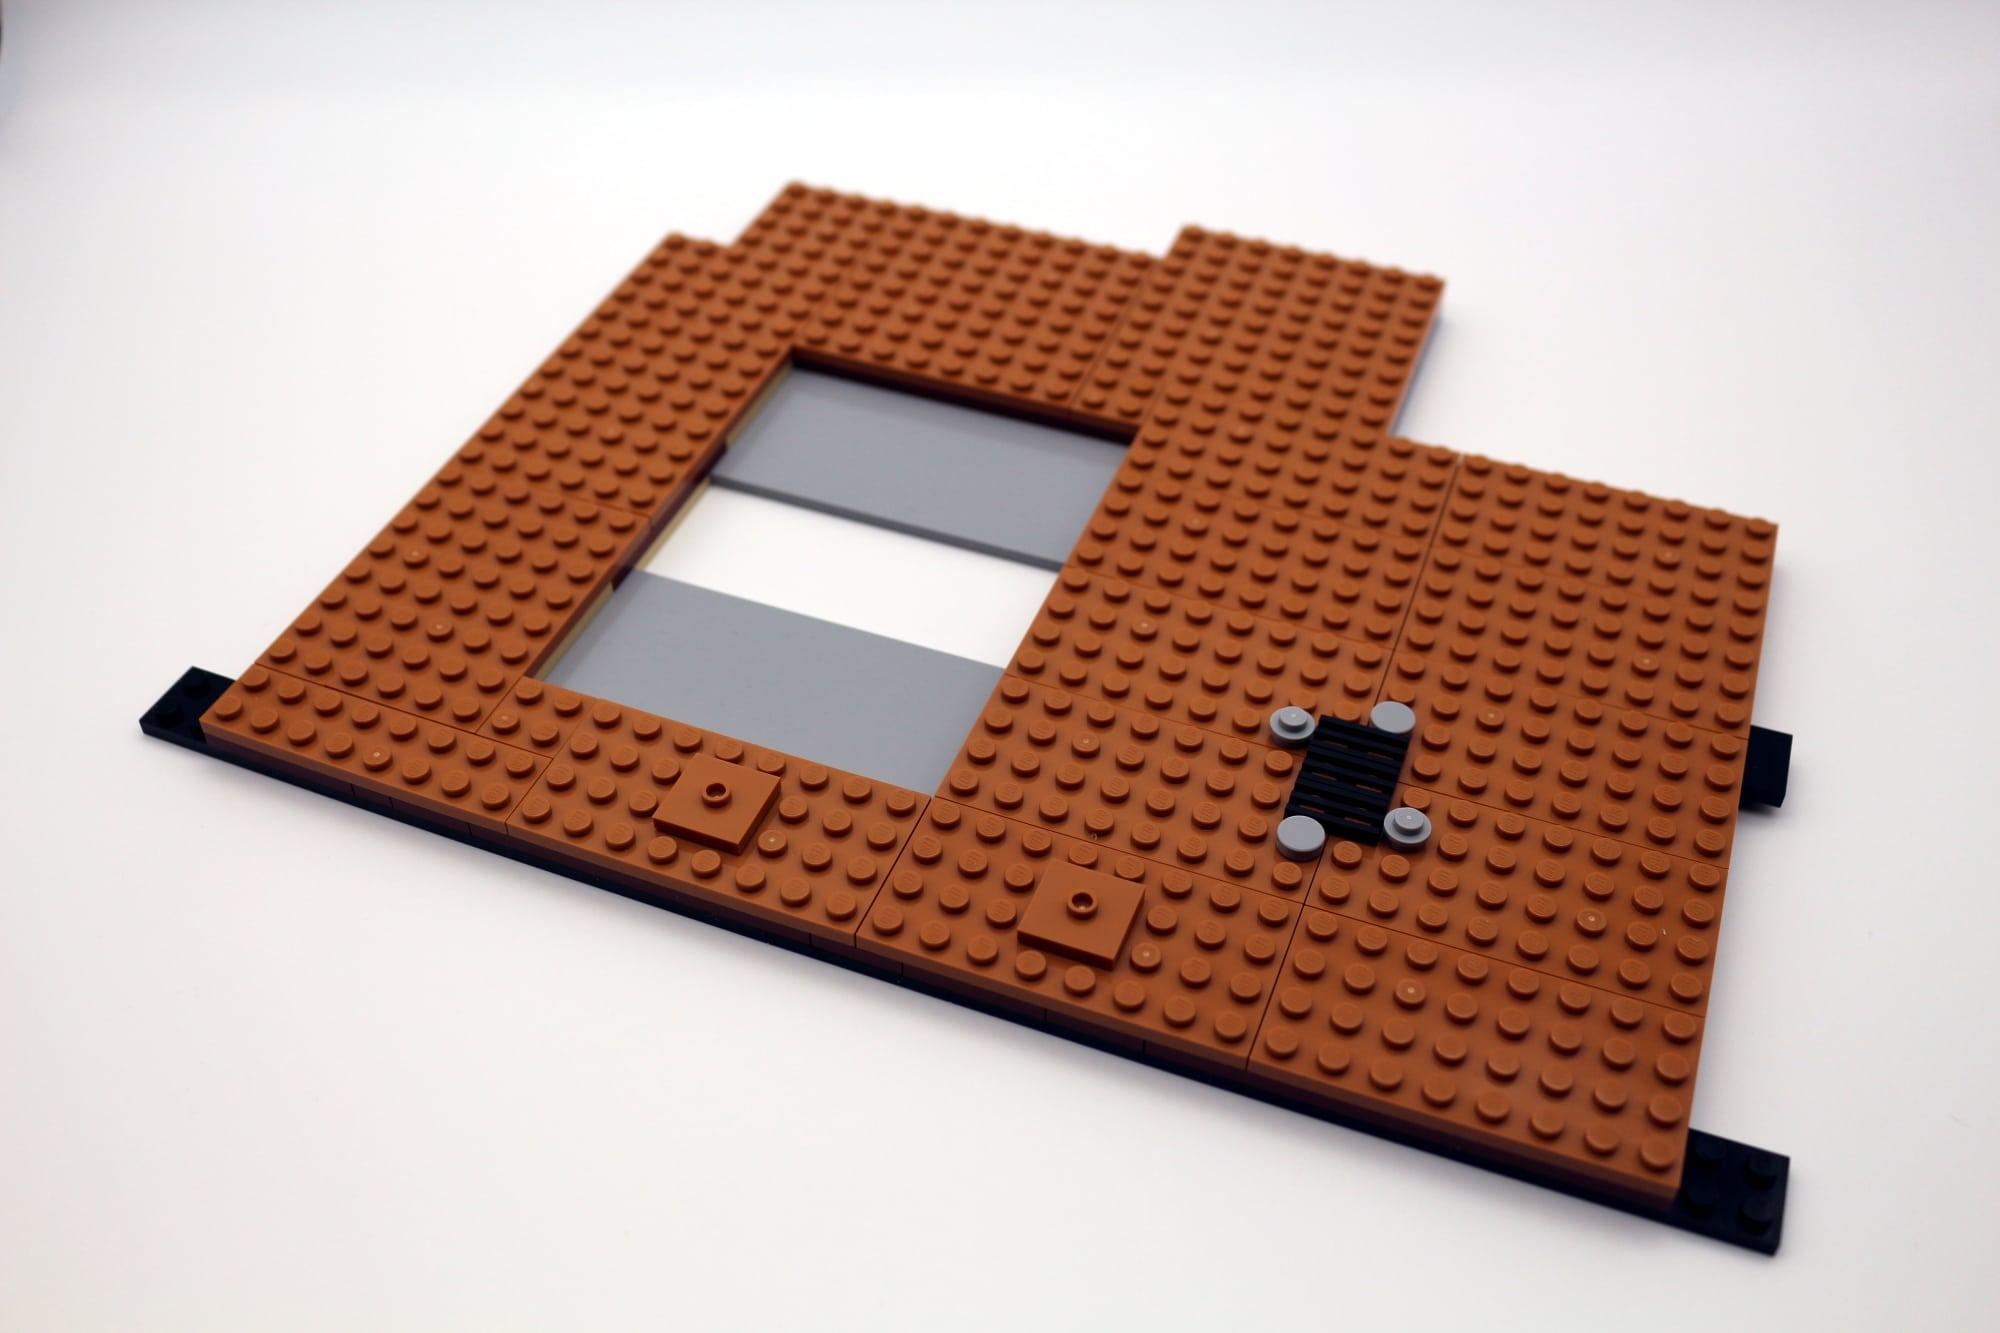 LEGO Friends 10292 The Friends Apartments 14